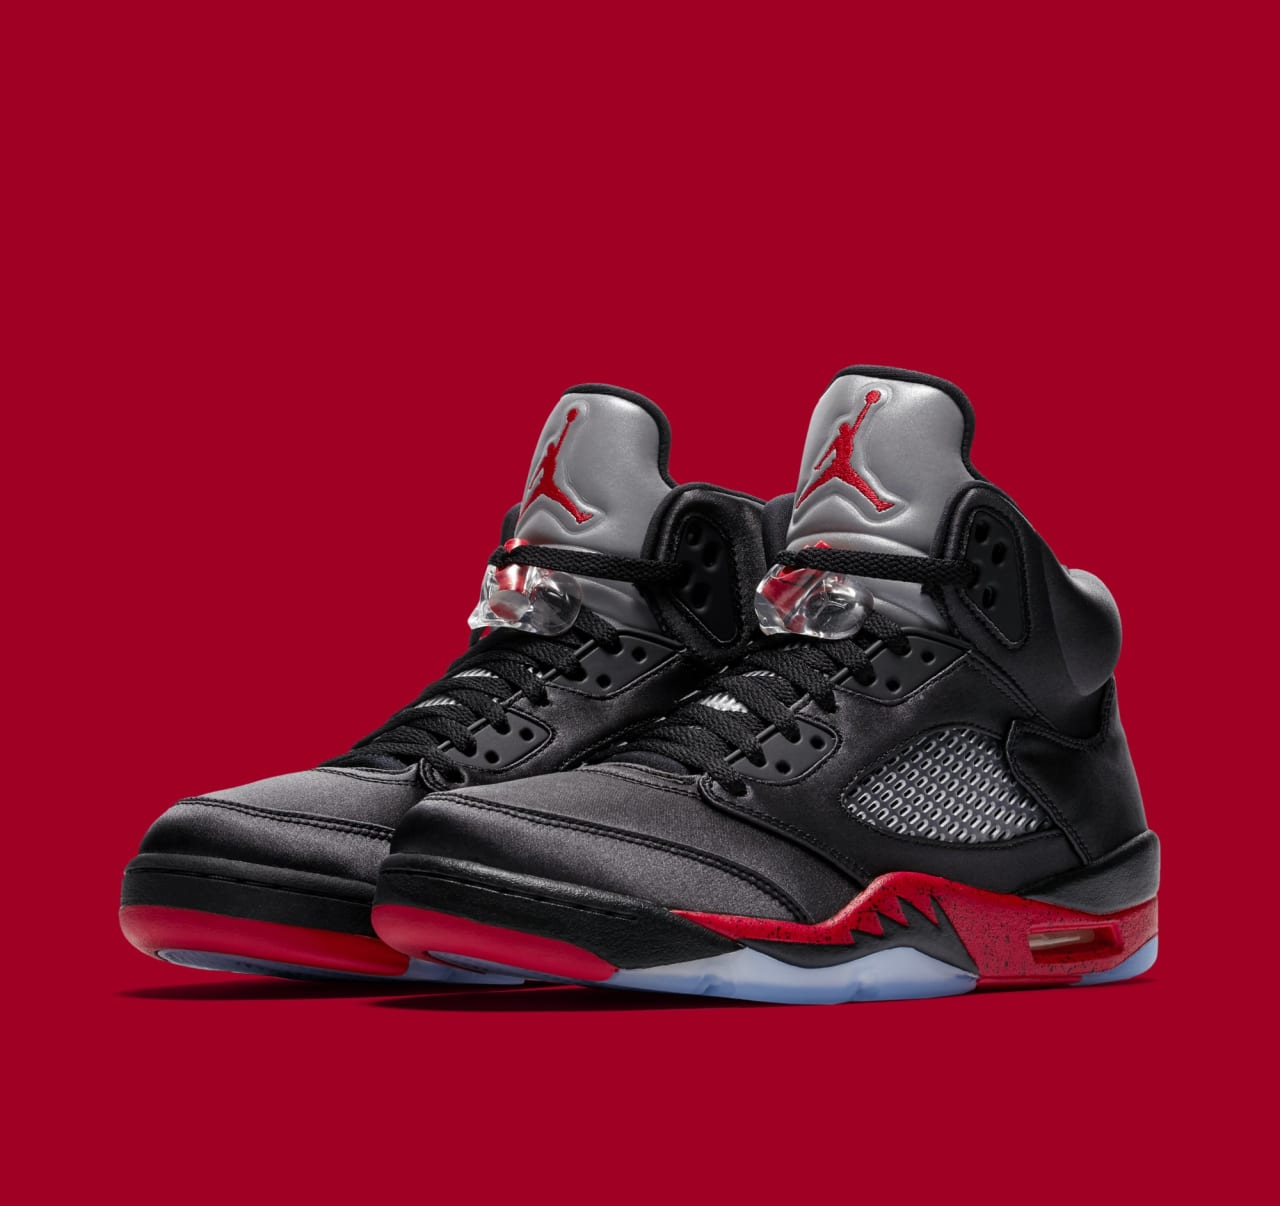 25d3dace507 Air Jordan 5 'Black/University Red' Release Date   Sole Collector